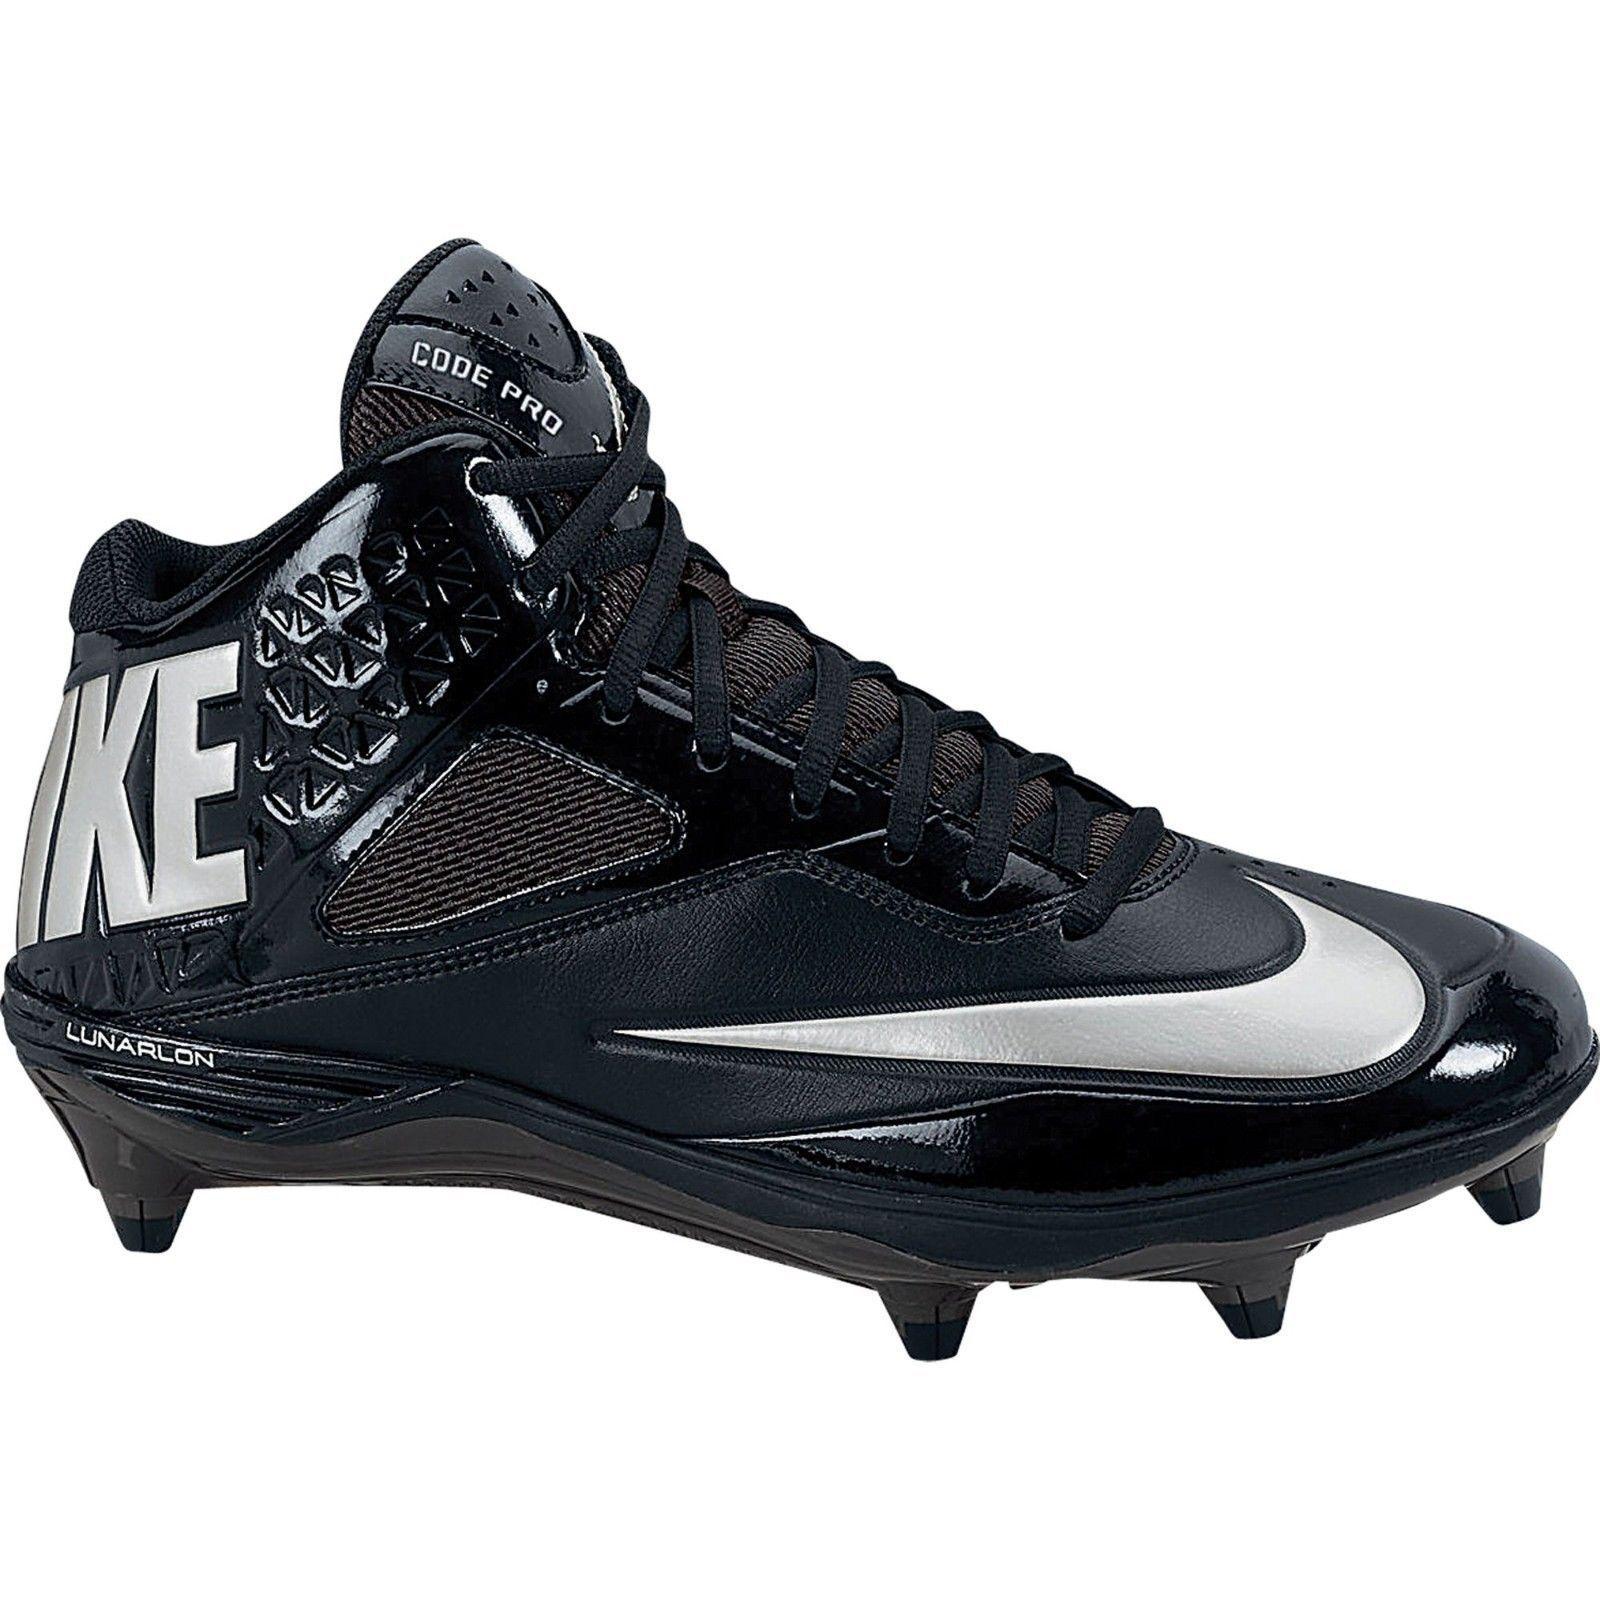 Nike Men's Lunar Code Pro 3/4 Detach Football Cleats, 579668 002 Comfortable Seasonal clearance sale